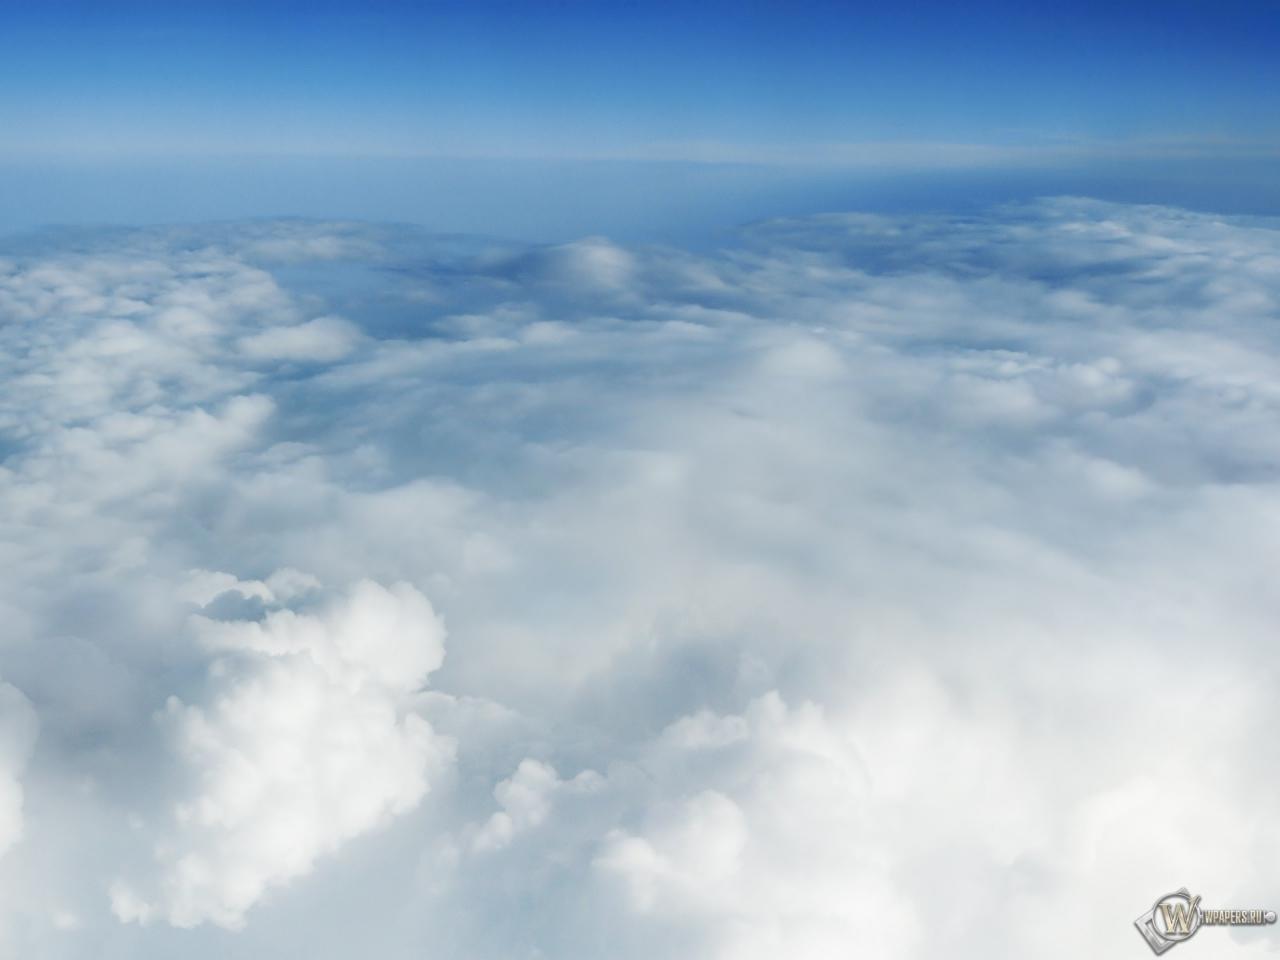 За облаками 1280x960